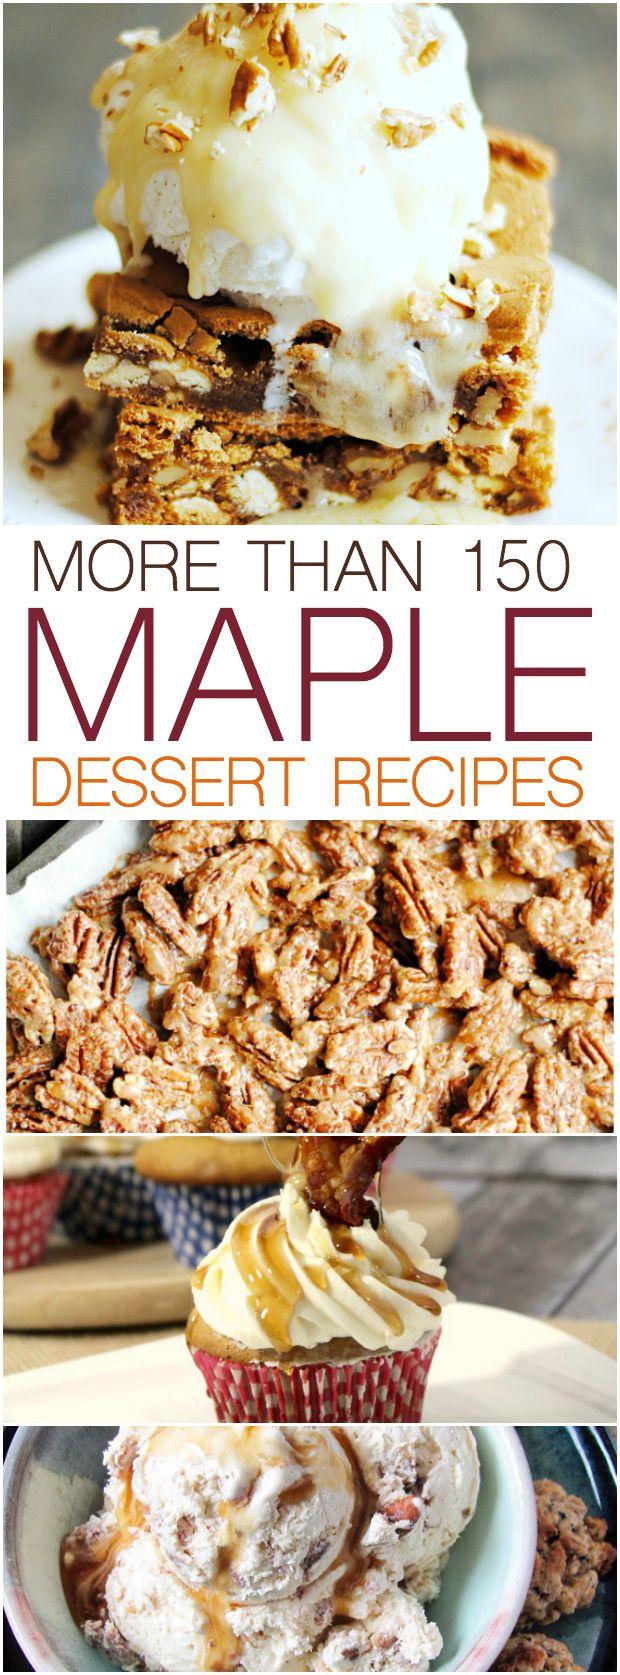 150+ Maple Desserts http://www.somethingswanky.com/150-maple-desserts/?utm_campaign=coschedule&utm_source=pinterest&utm_medium=Something%20Swanky&utm_content=150%2B%20Maple%20Desserts